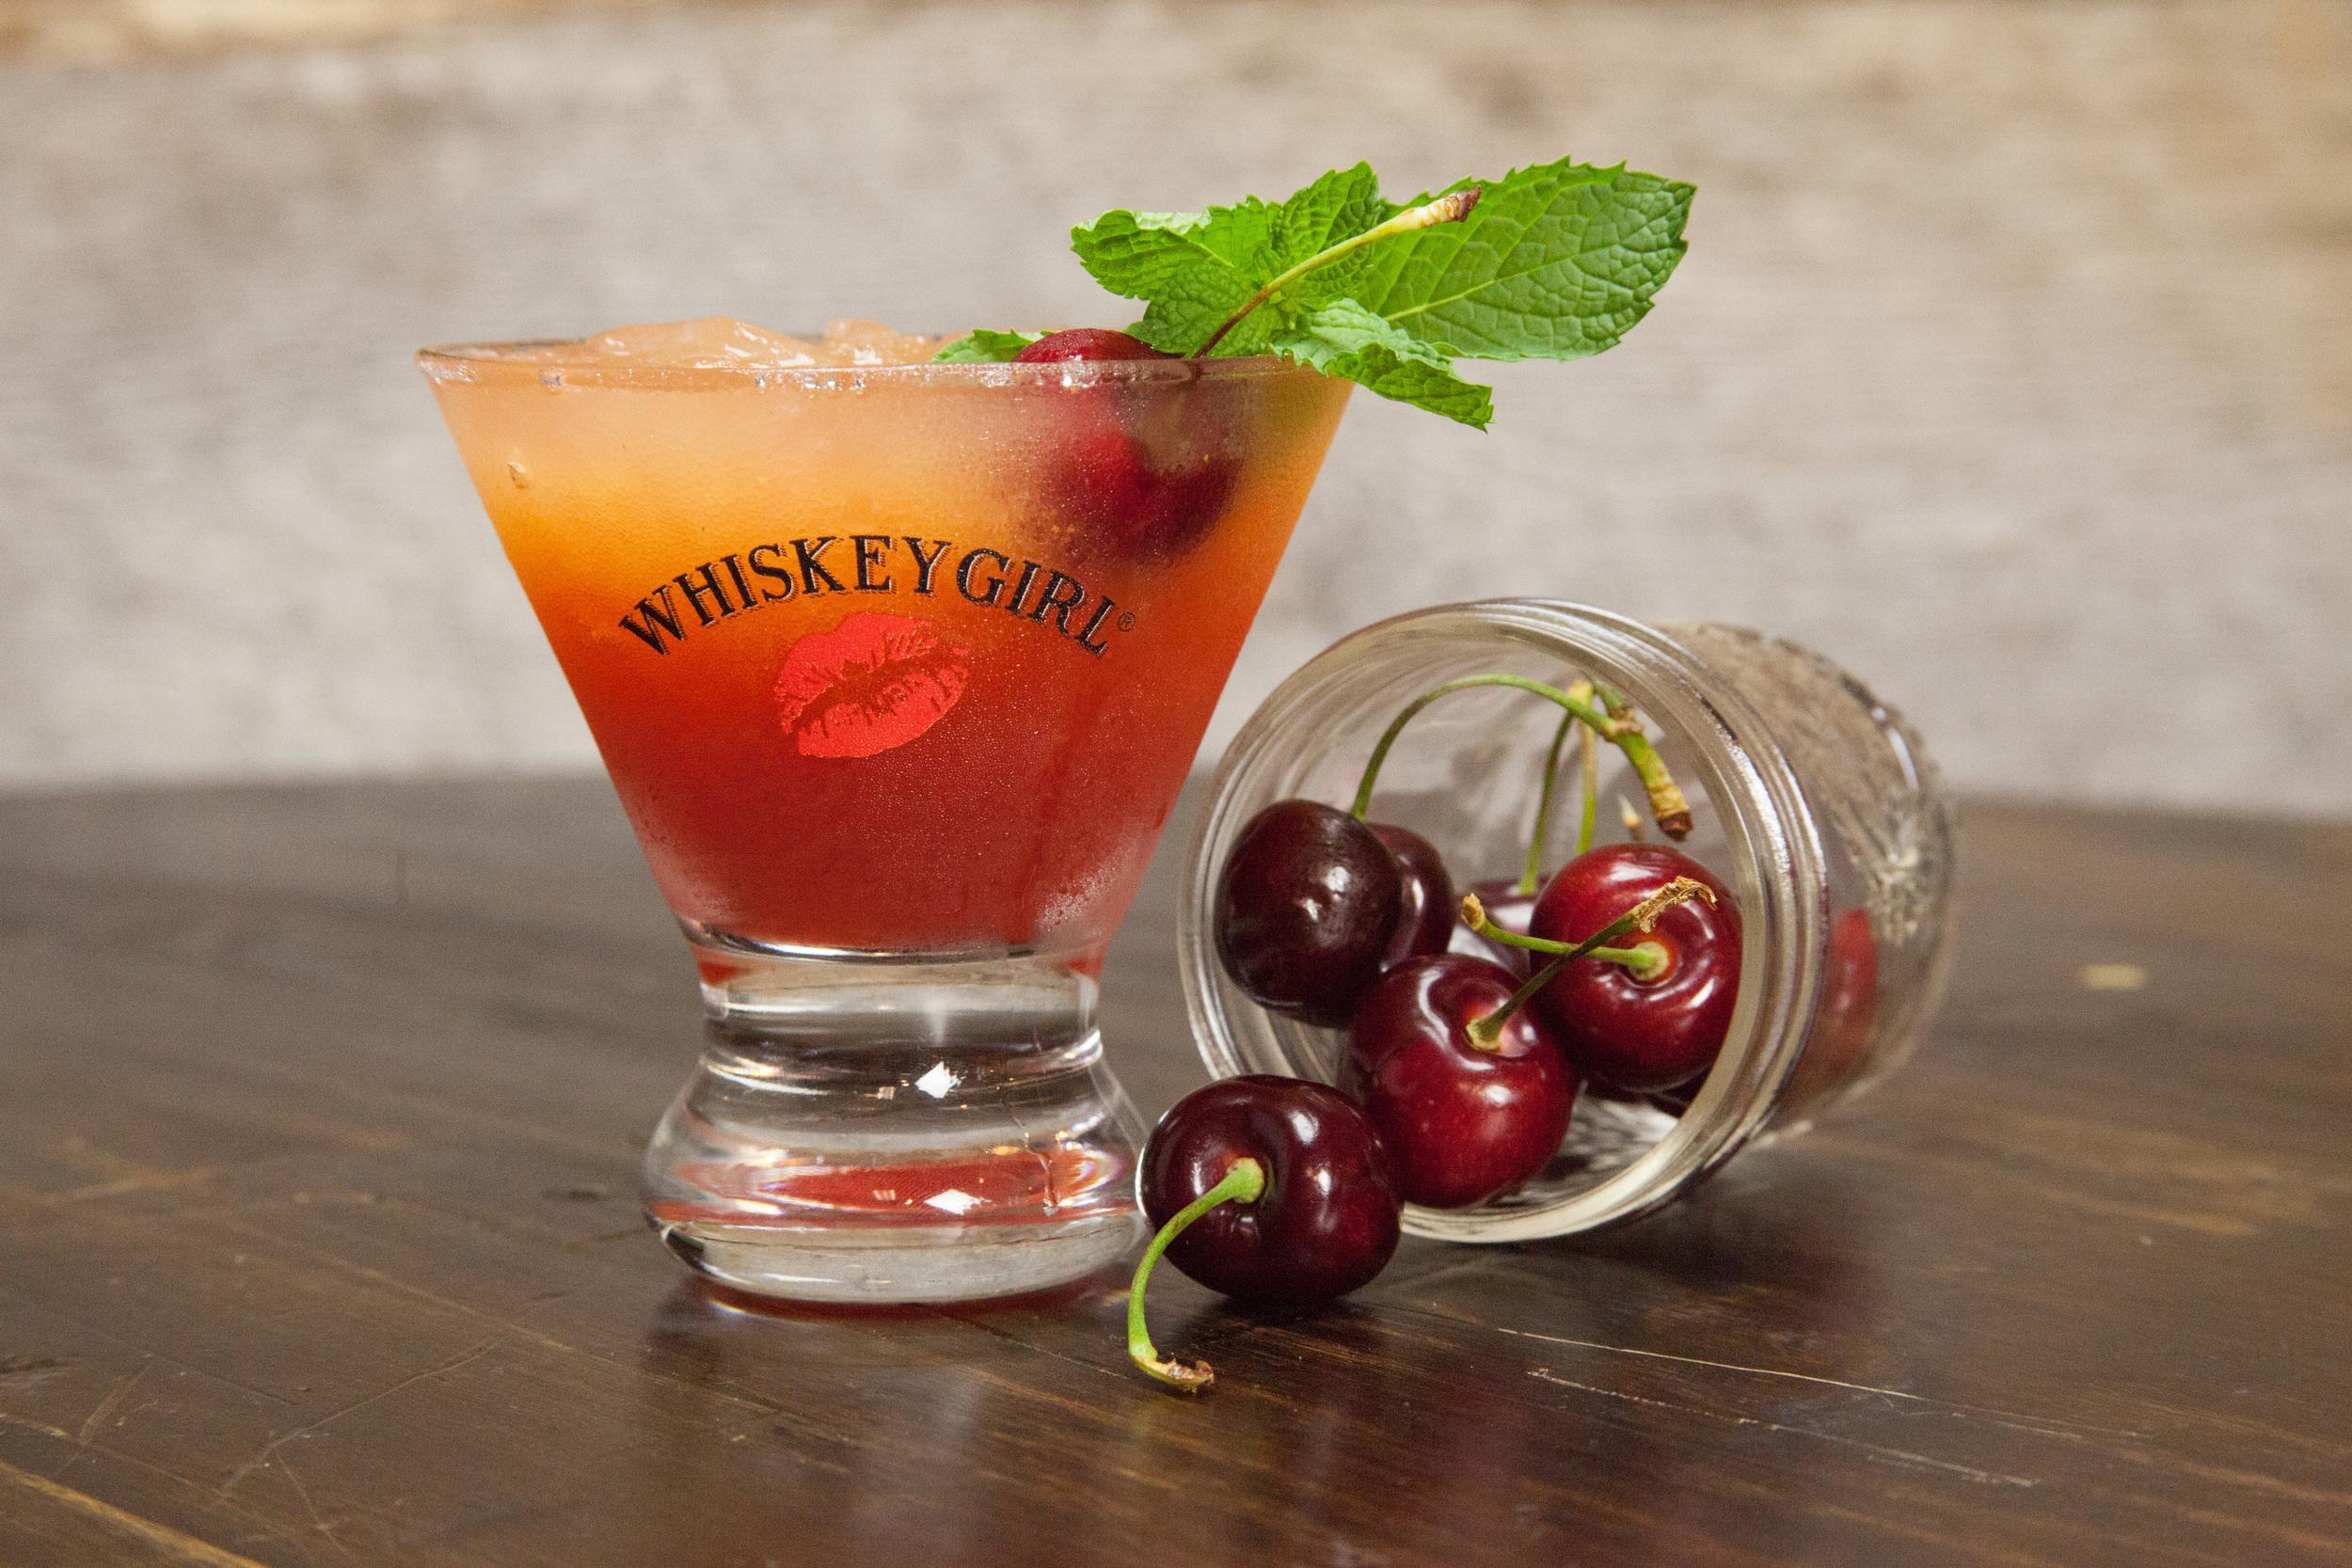 Whiskey Girl Cocktail